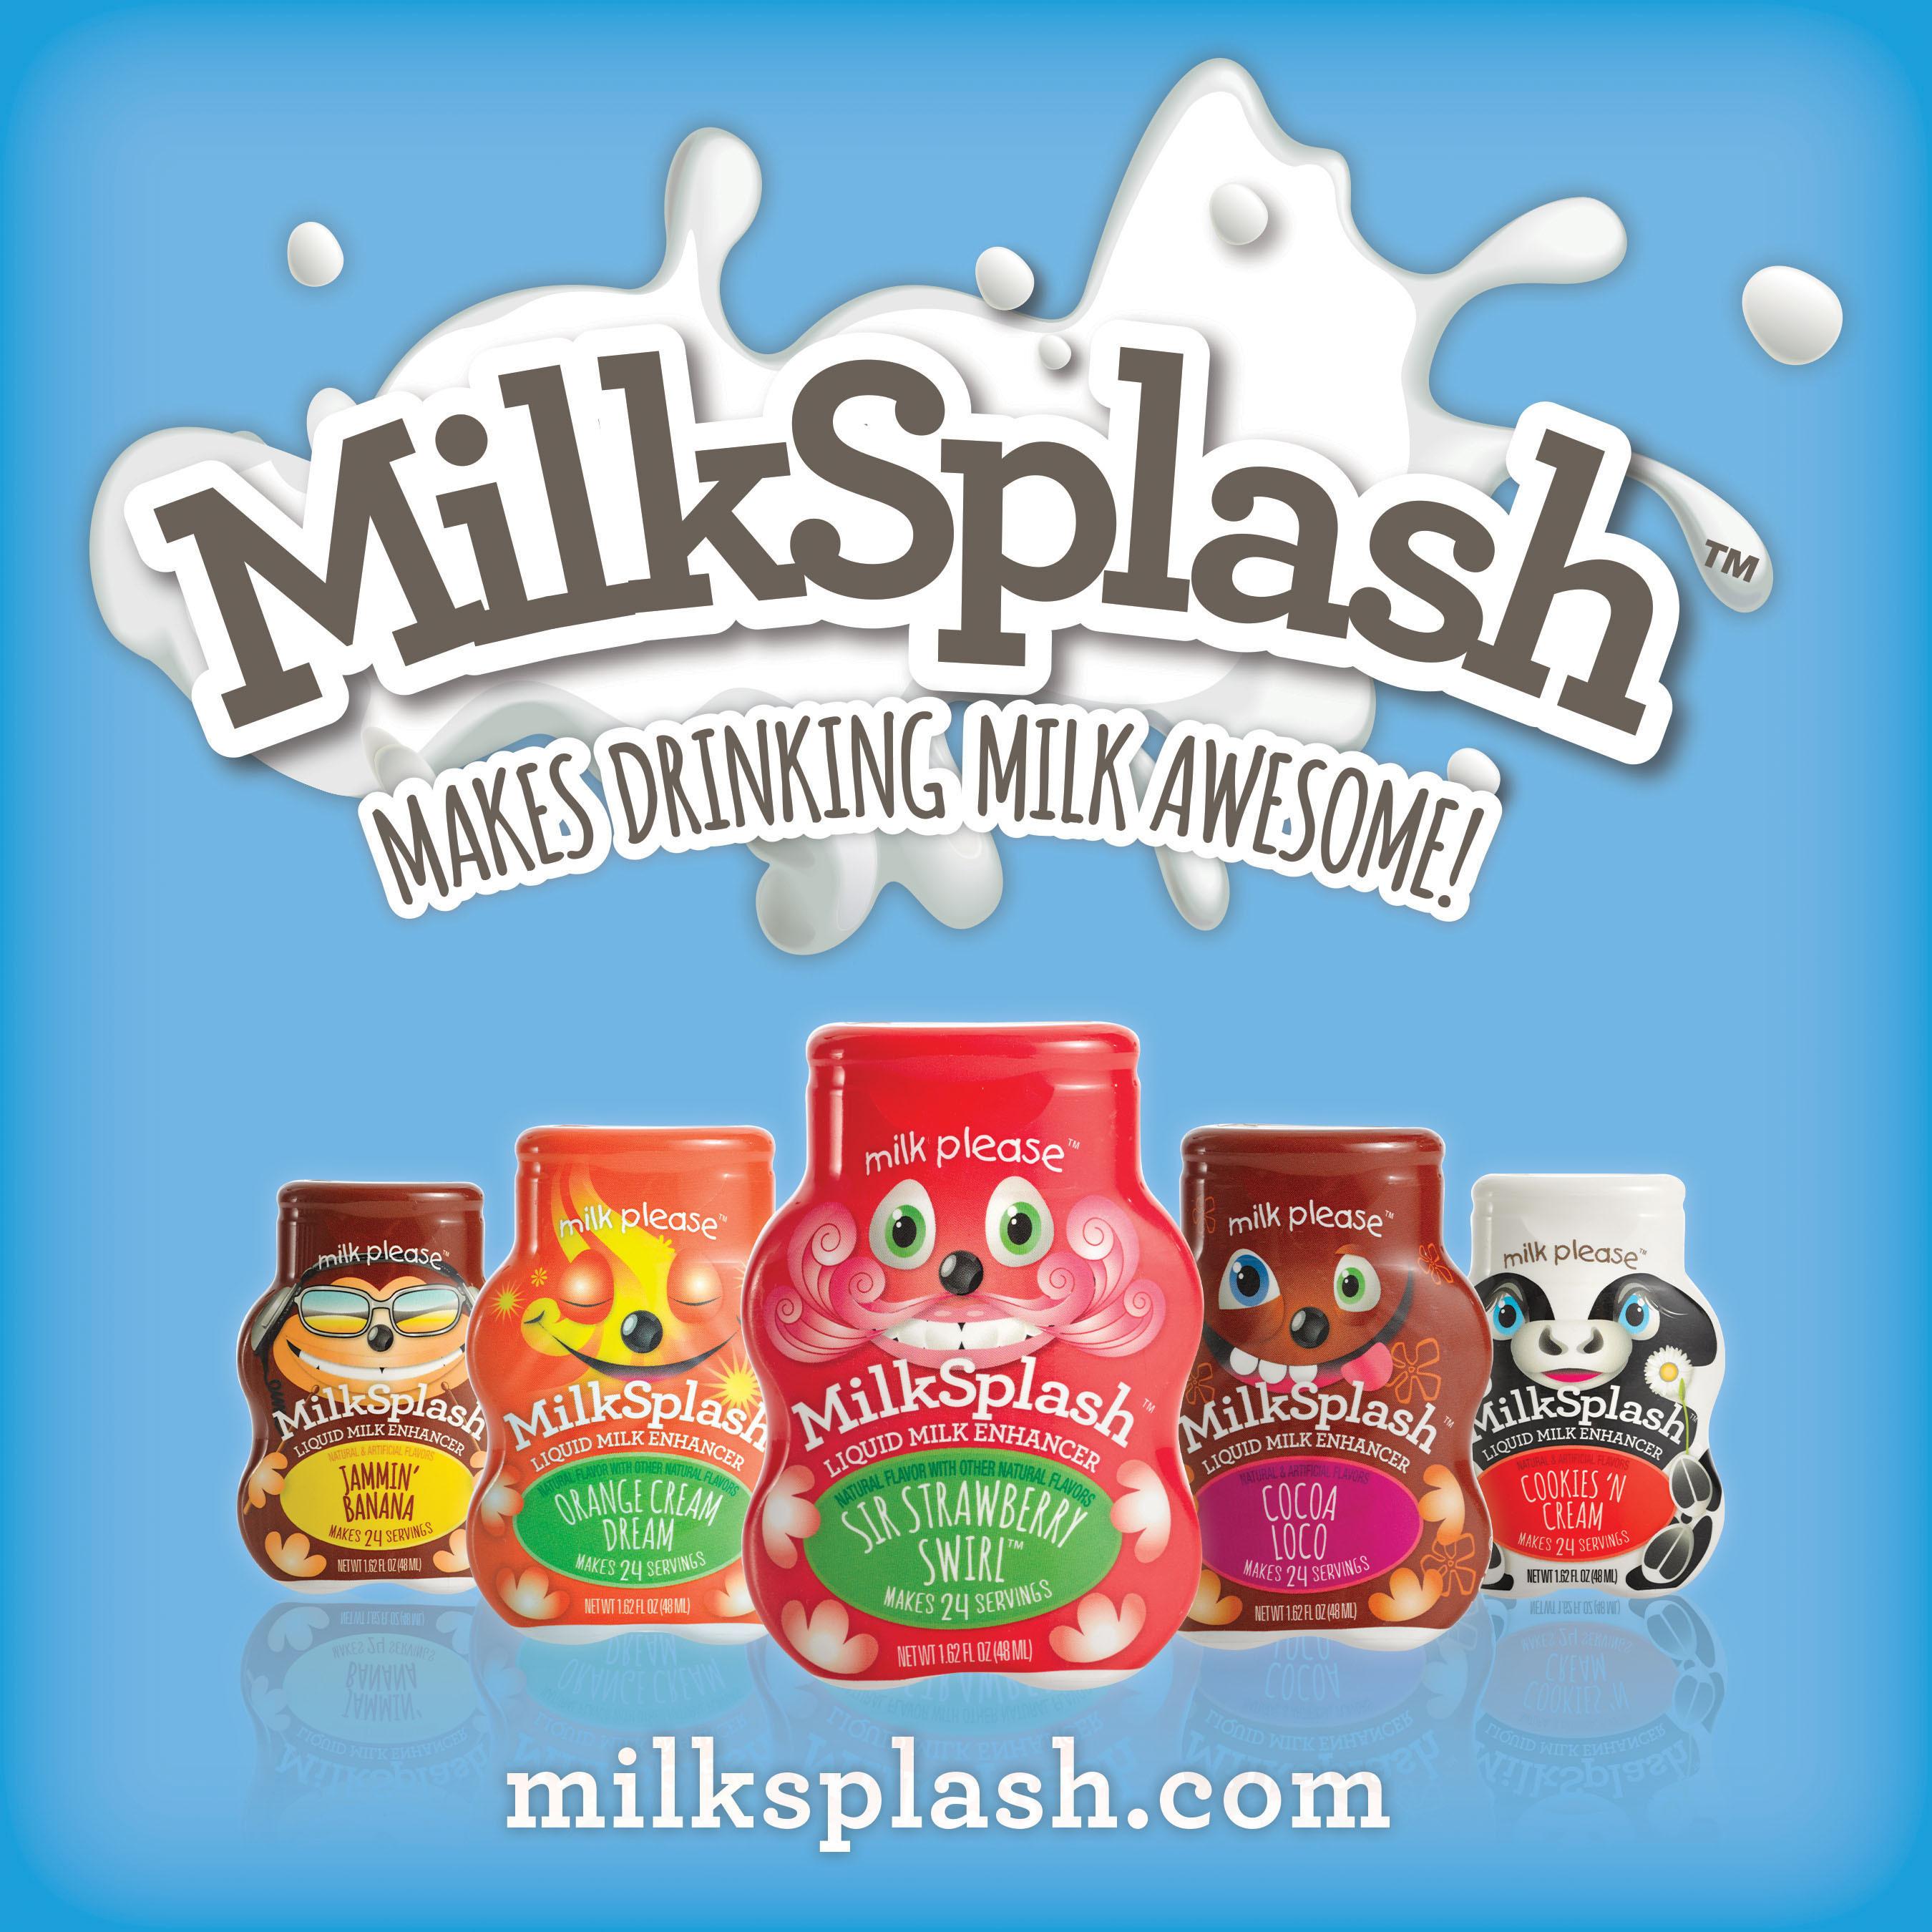 For more information about MilkSplash(TM), including where to buy, visit www.milksplash.com. (PRNewsFoto/S&D Beverage Innovations, LLC.) (PRNewsFoto/S&D BEVERAGE INNOVATIONS, LLC.)